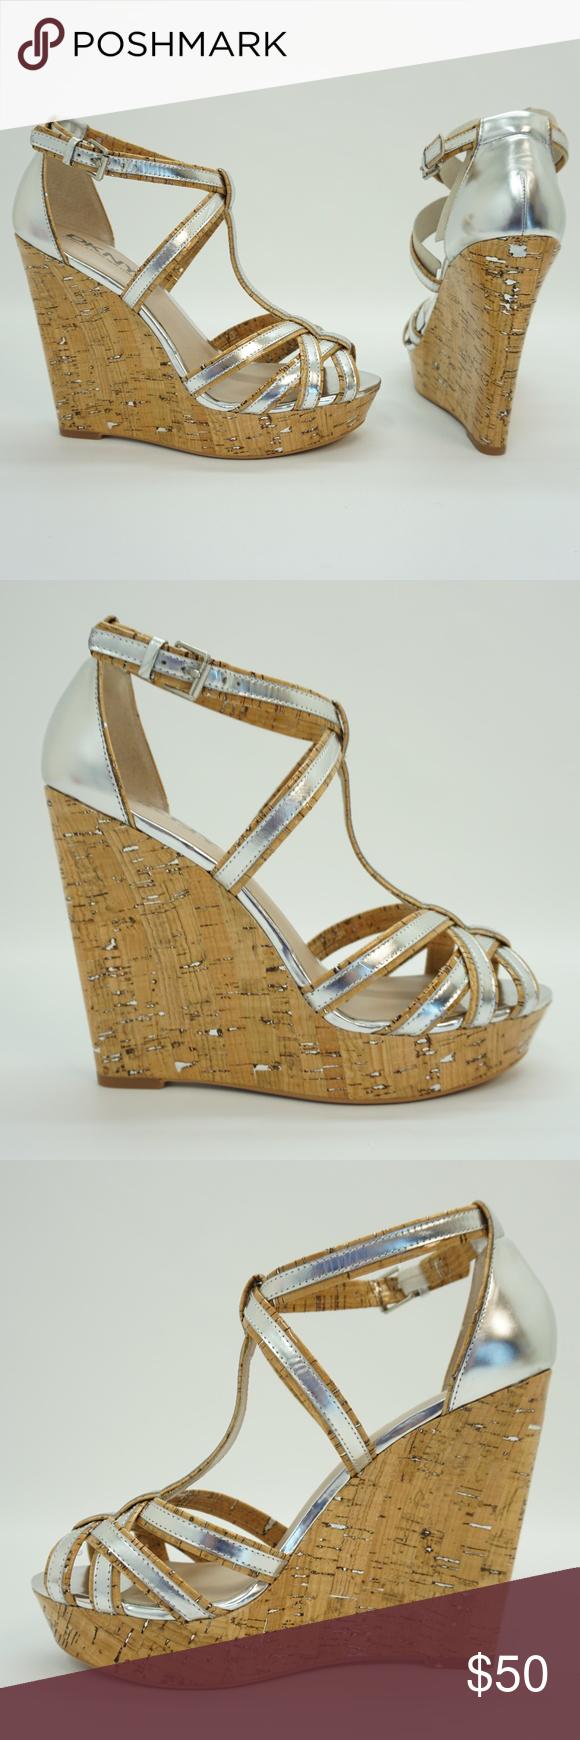 419cadb4adb DKNY Ankle Strap Platform High Heel Wedge Sandals DKNY Womens Shoes ...